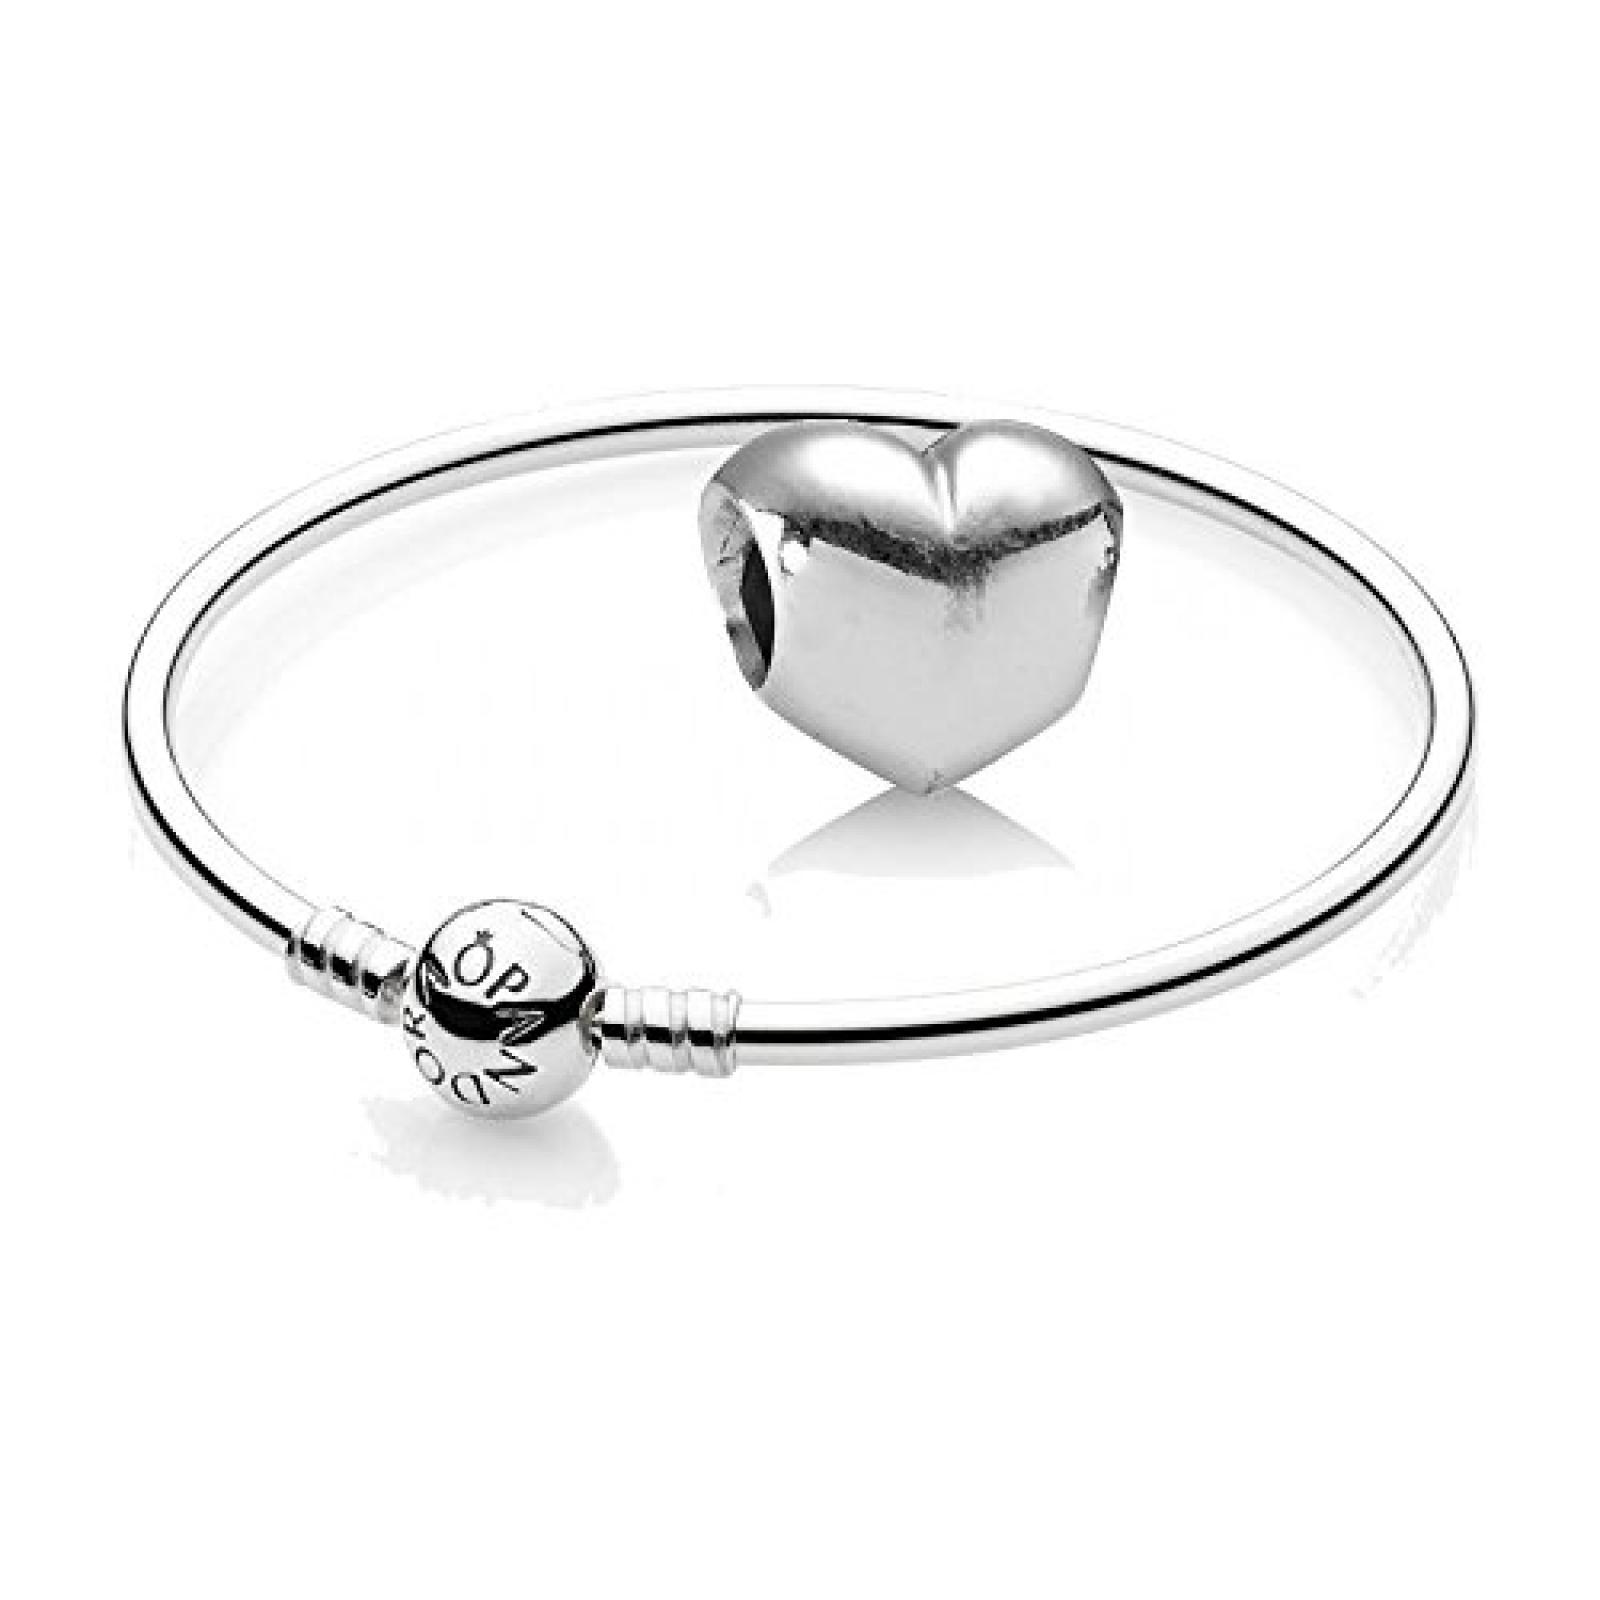 Original Pandora Geschenkset - 1 Silber Armreif 590713 und 1 Silber Element Glattes Herz 790137